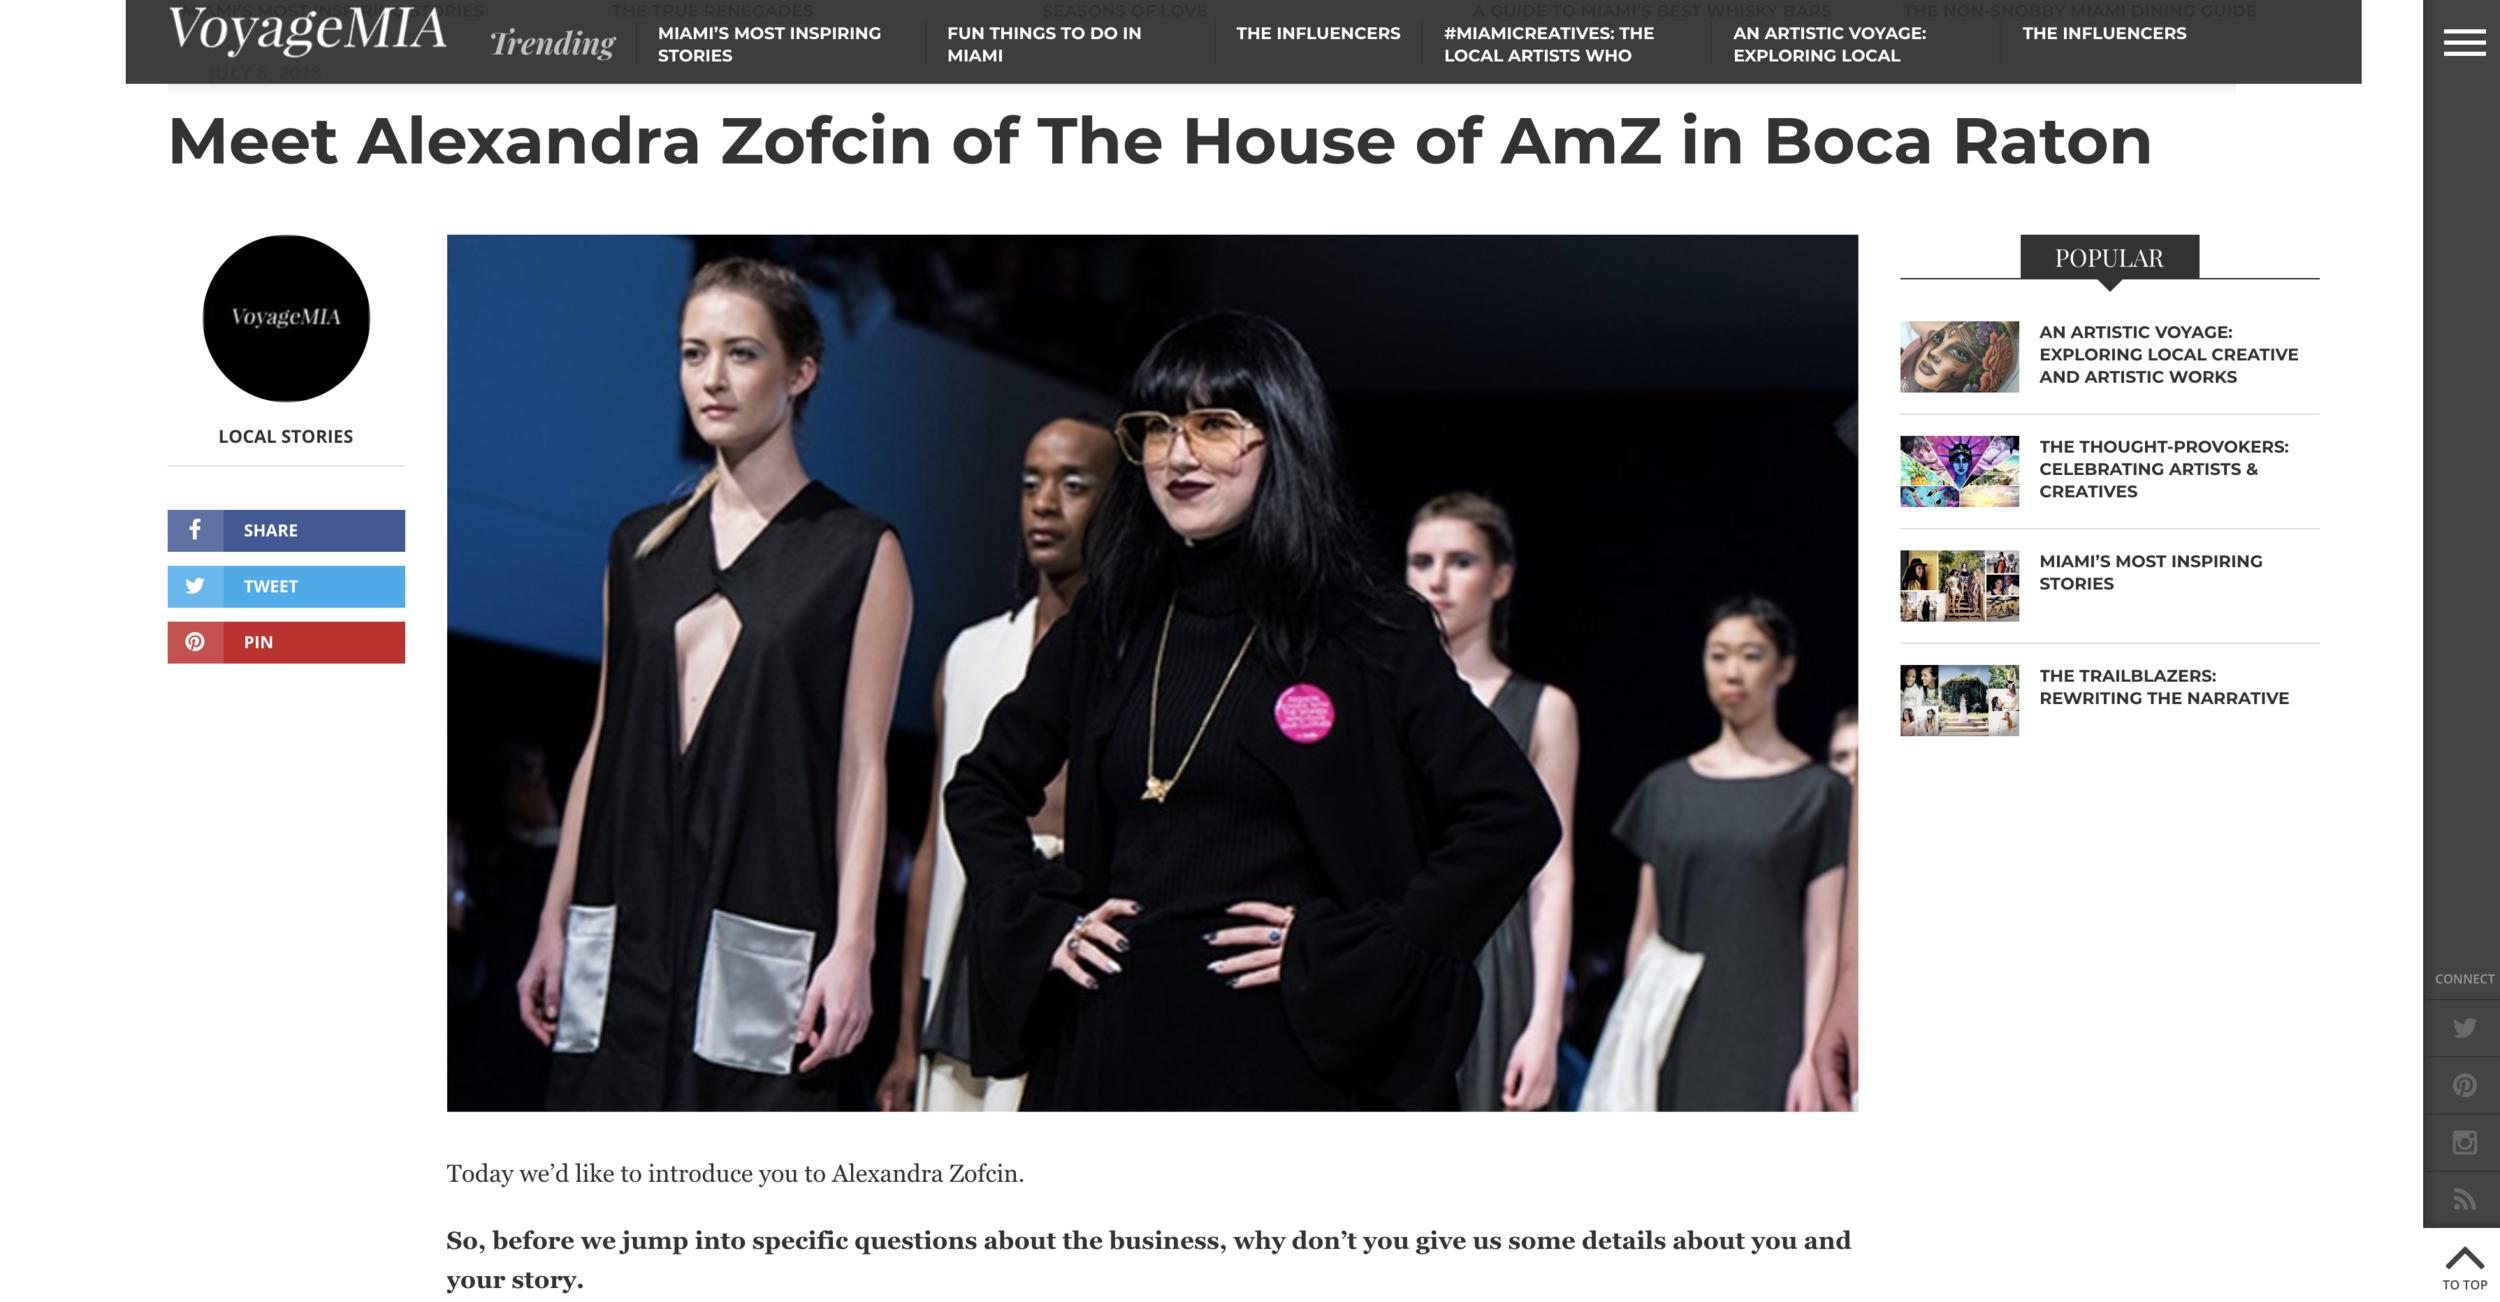 Meet Alexandra Zofcin of The House of AmZ in Boca Raton | VoyageMIA